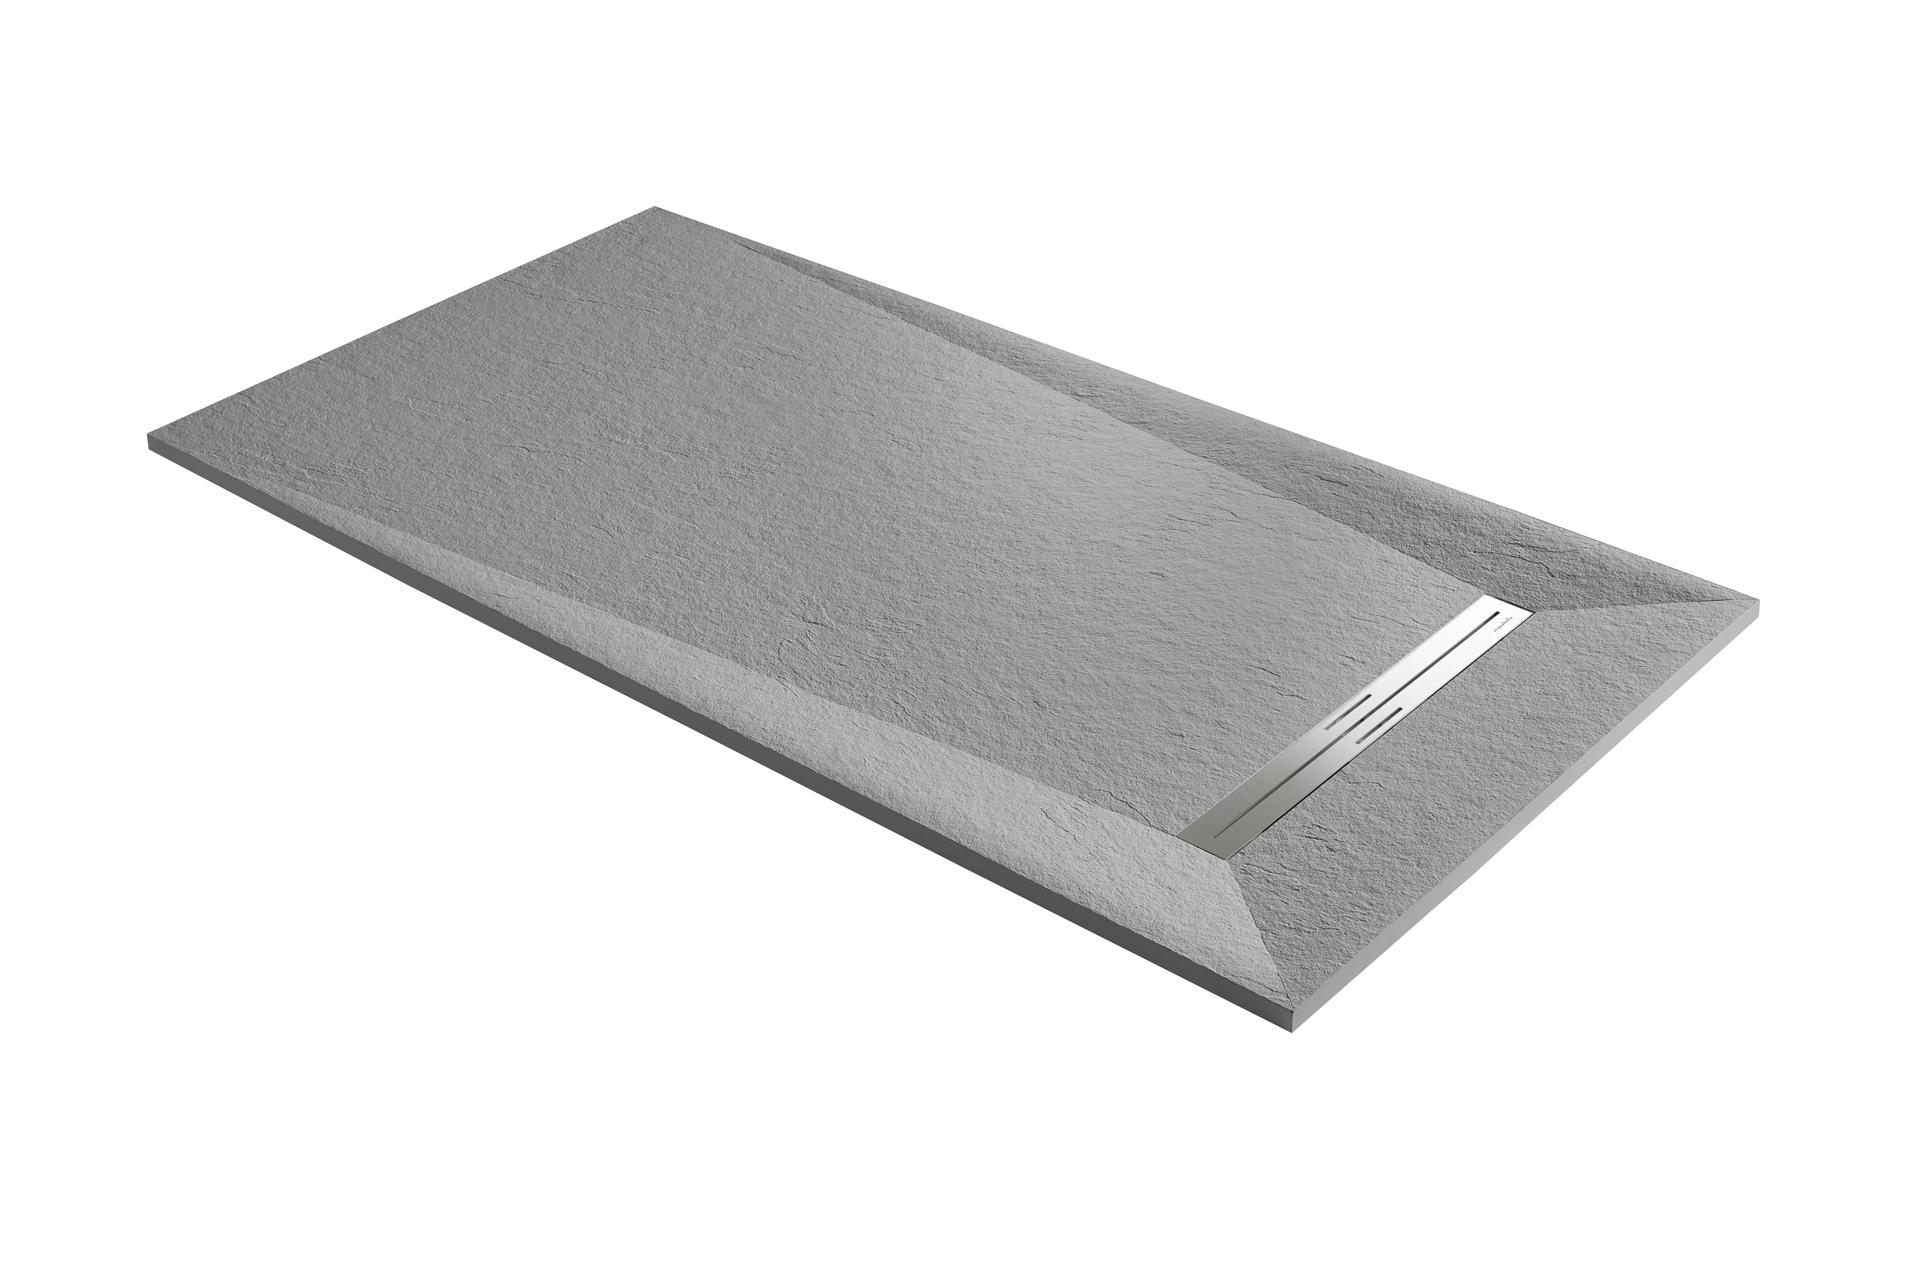 AQUABELLA PLATO DE DUCHA PRISMA SLATE blanco40_sinsuelo_cemento